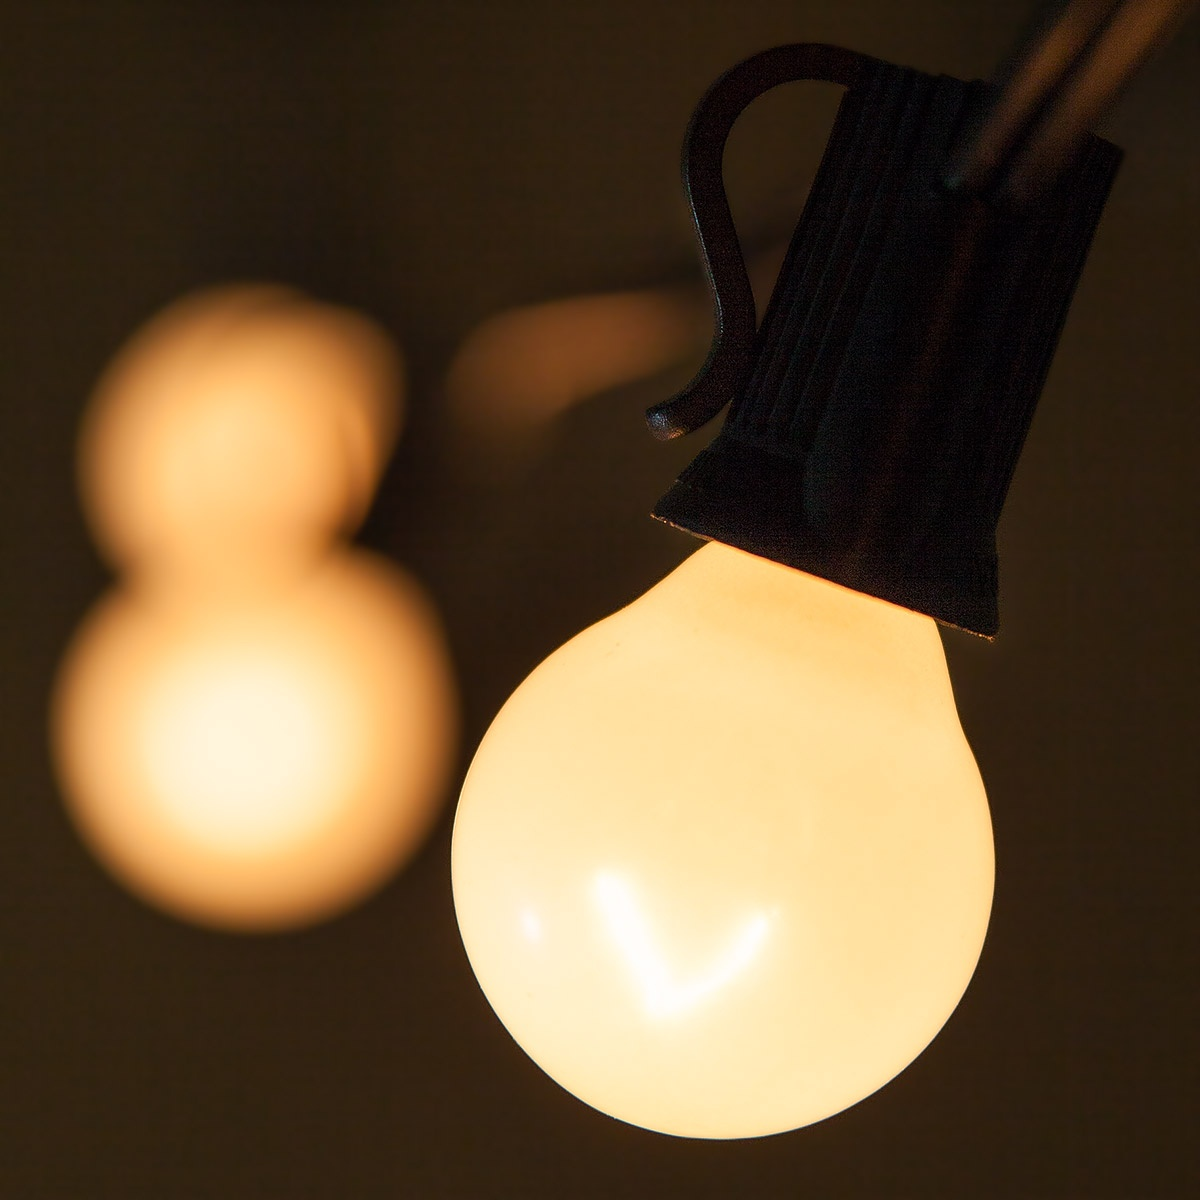 Patio Lights Pearl White Satin Lights 15 G30 E12 Bulbs